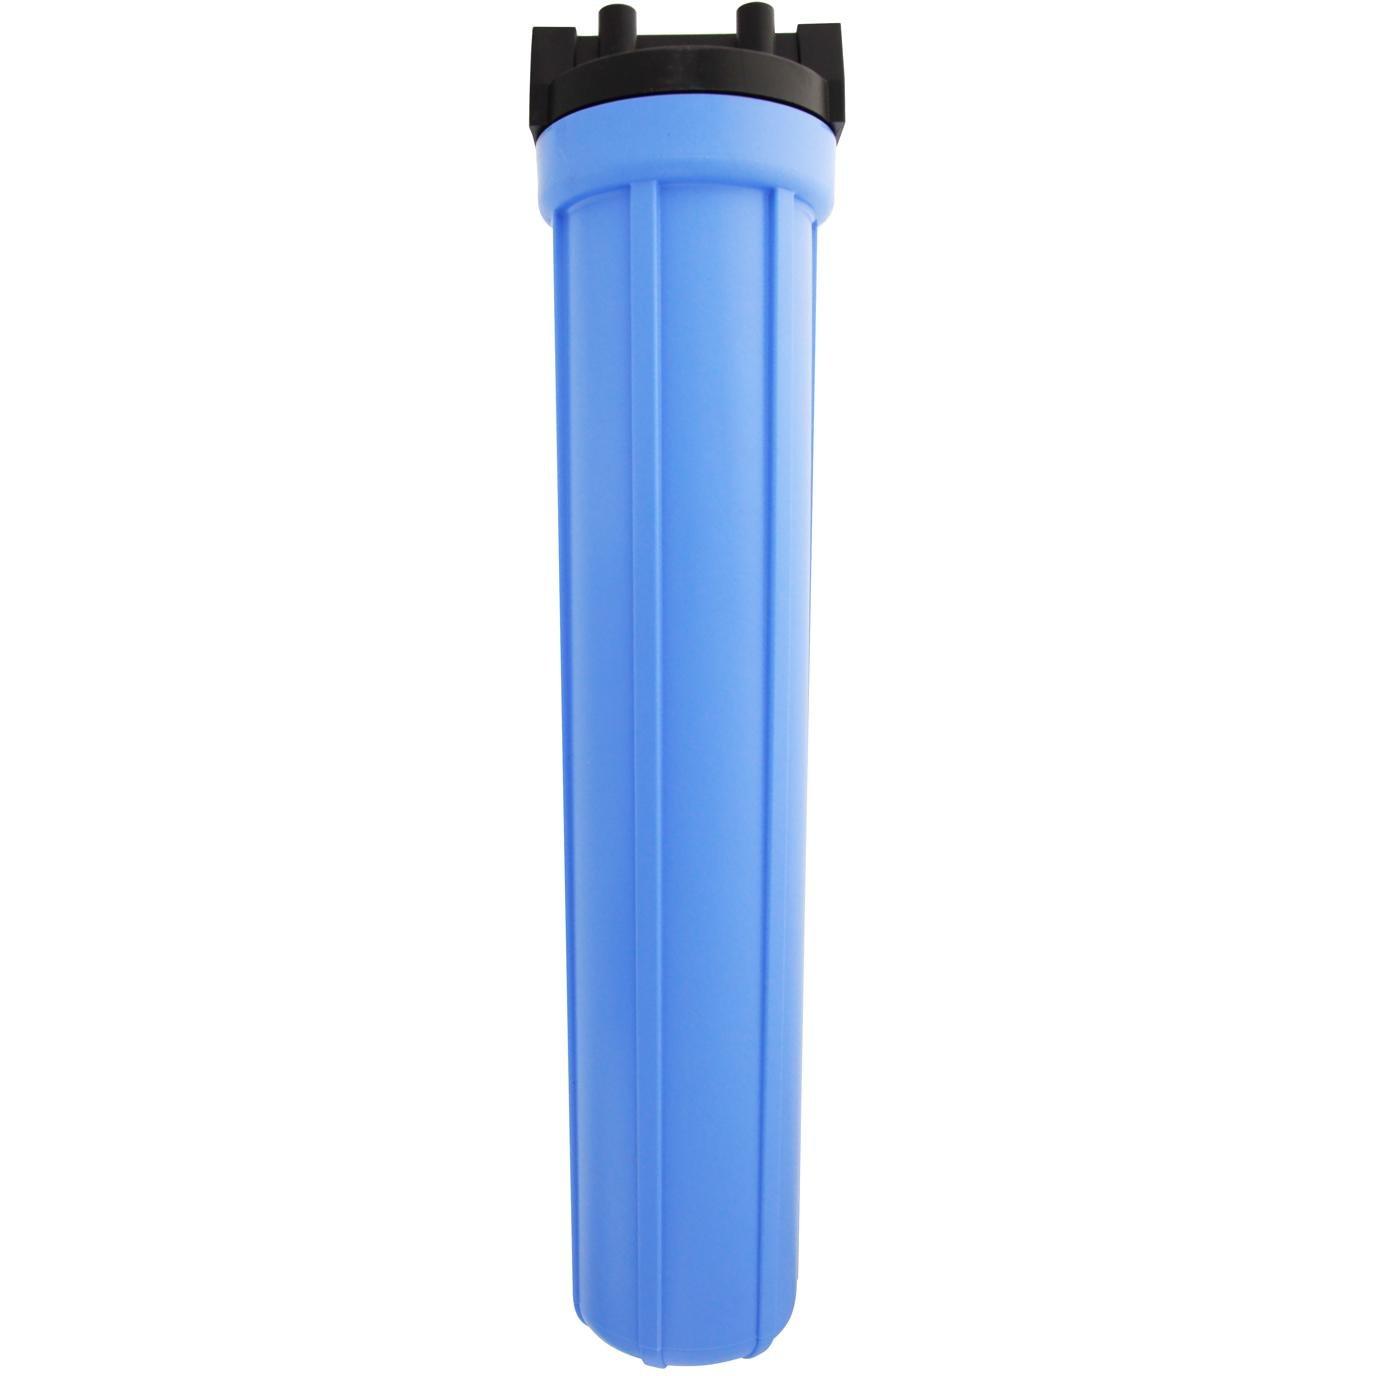 "Pentek PENTEK-150069 Water Filter Housing, 20"""